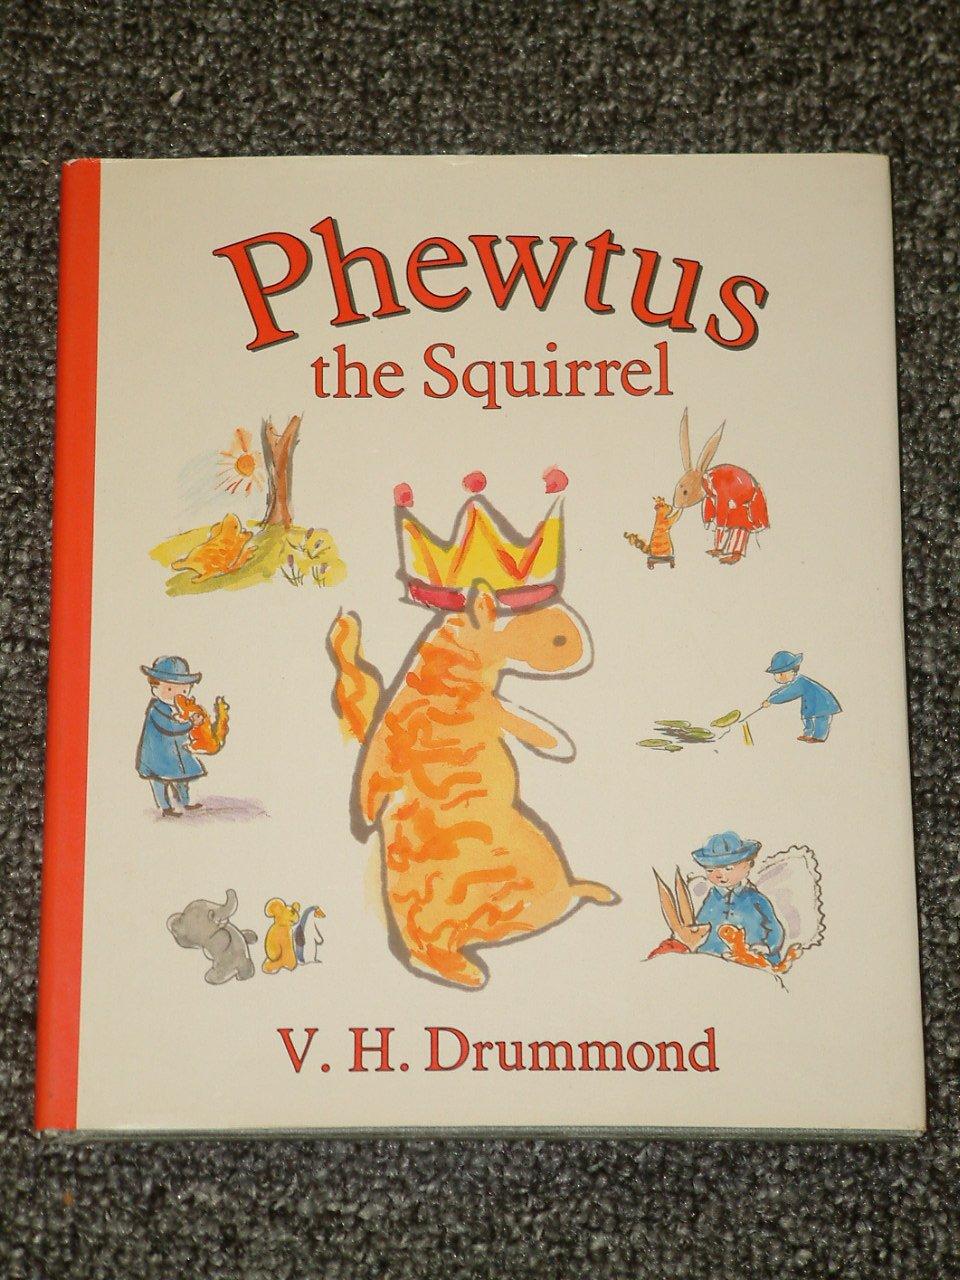 Phewtus the Squirrel by V. H. Drummond HB DJ